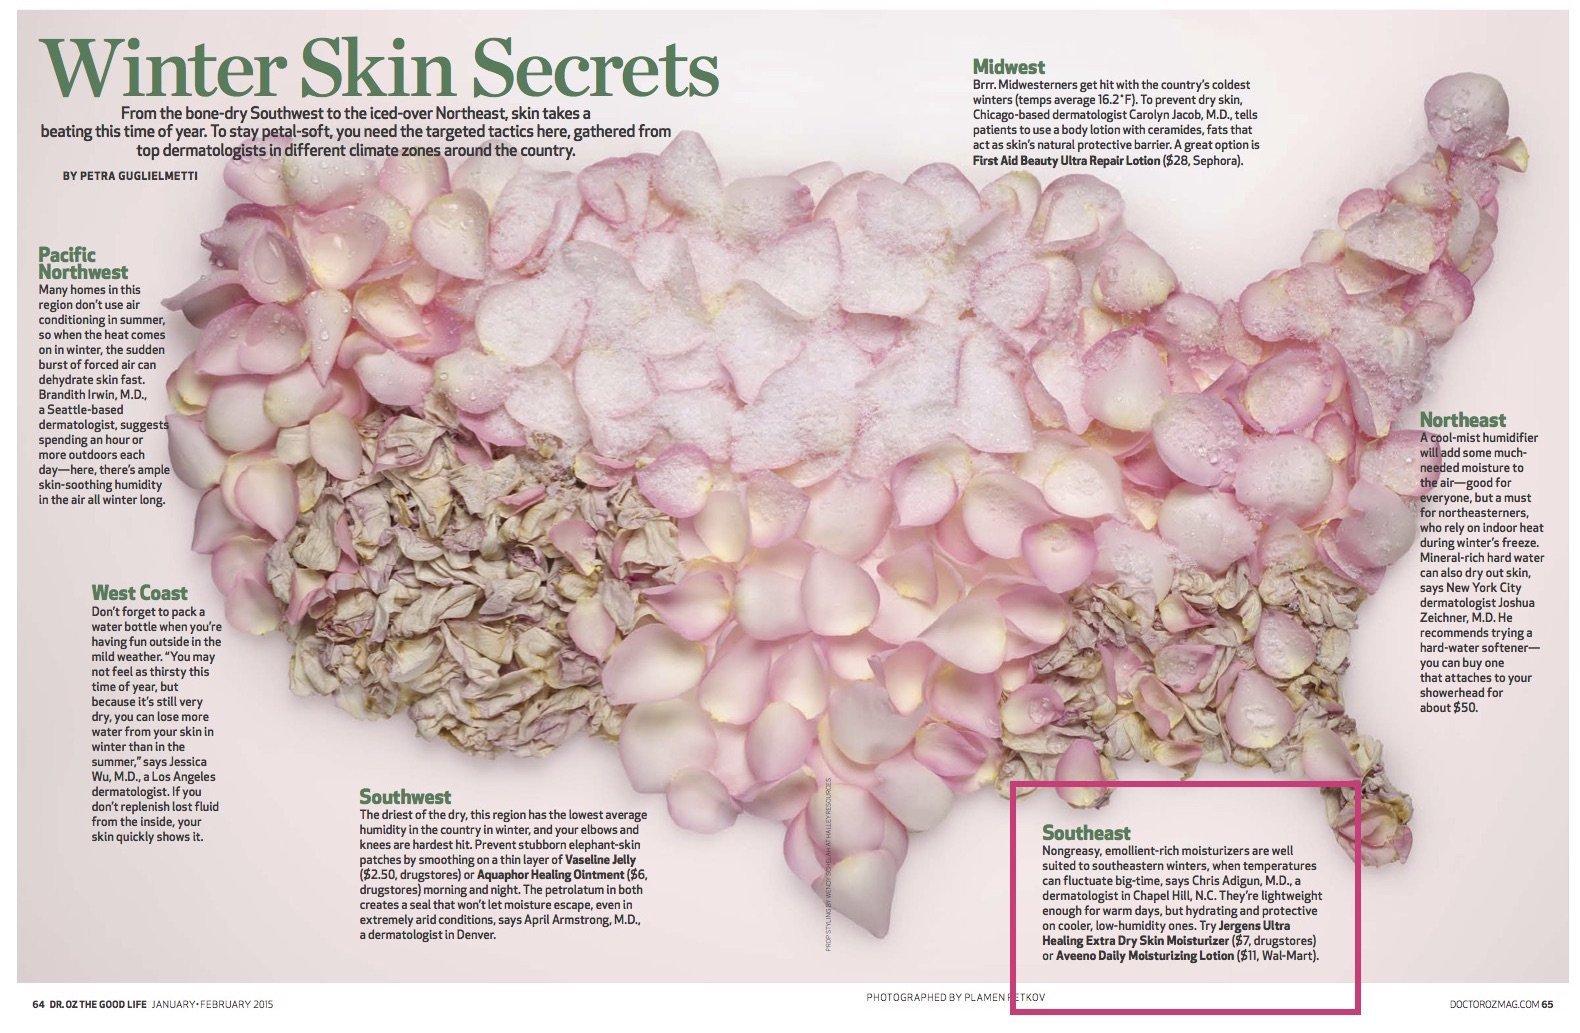 2015 0101 Droz Winter Skin Map Dermatology Laser Center Of Days Beauty Water